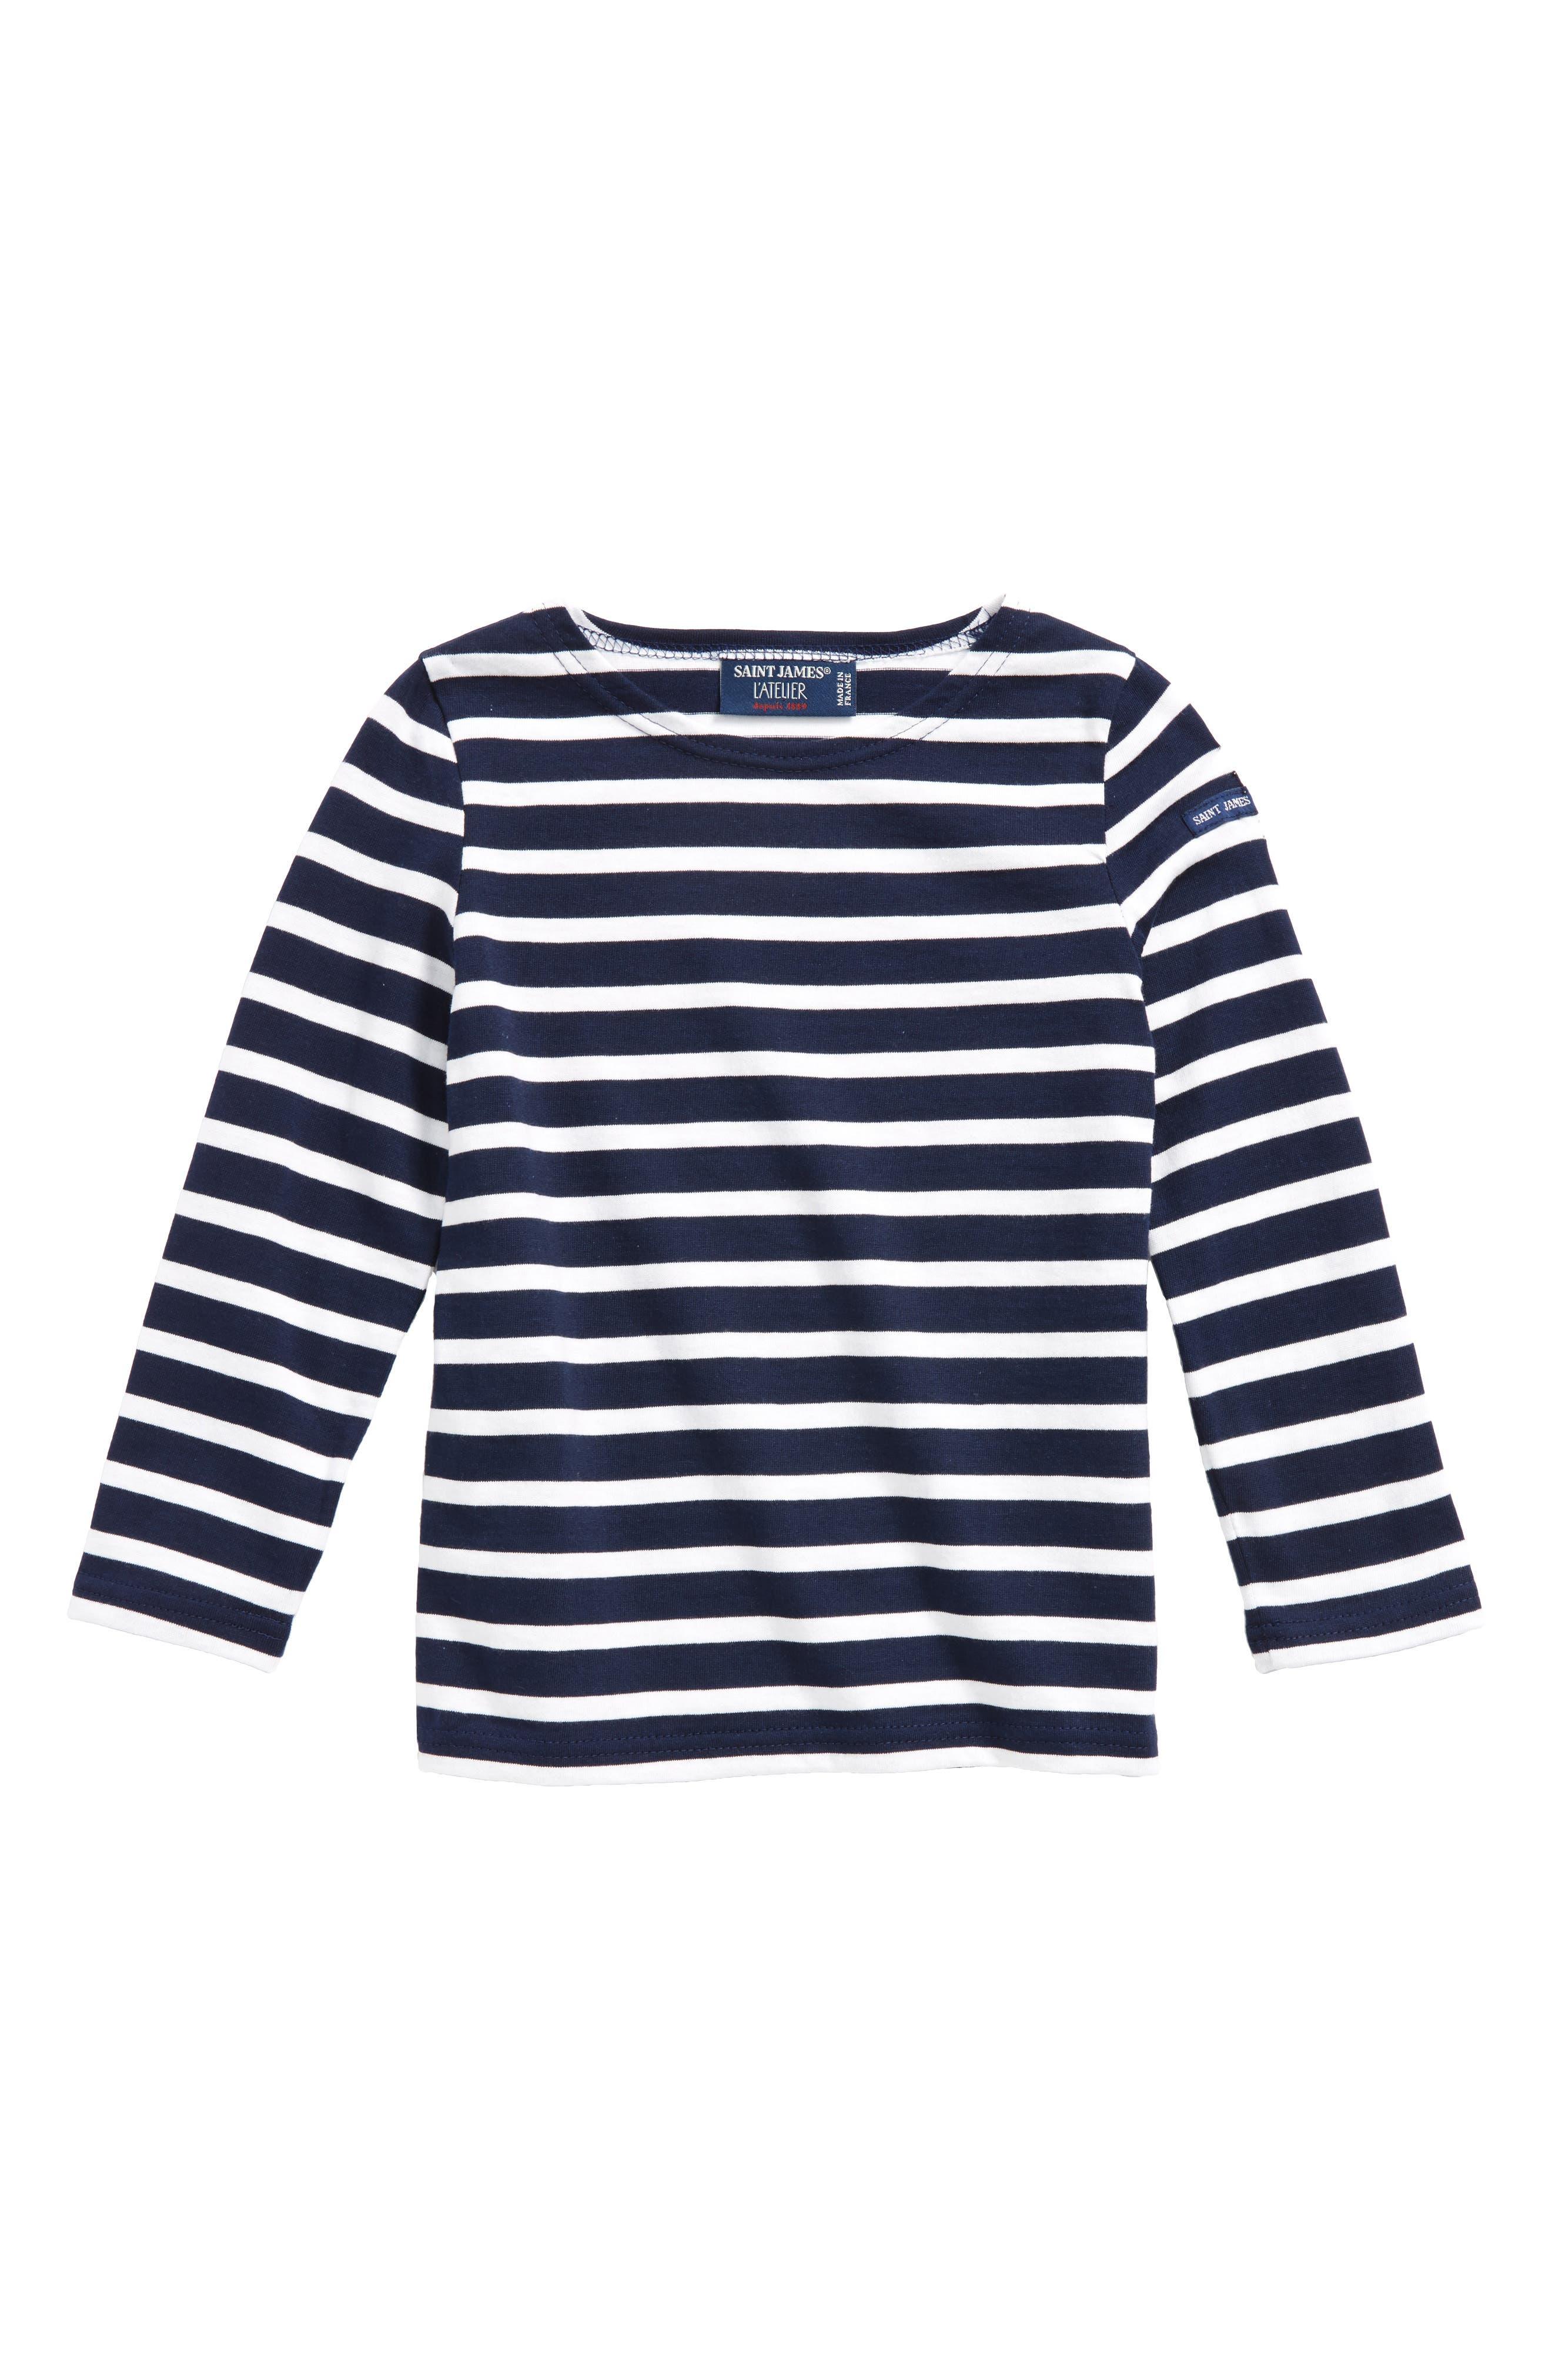 Minquiers Striped Sailor Shirt,                             Main thumbnail 1, color,                             400